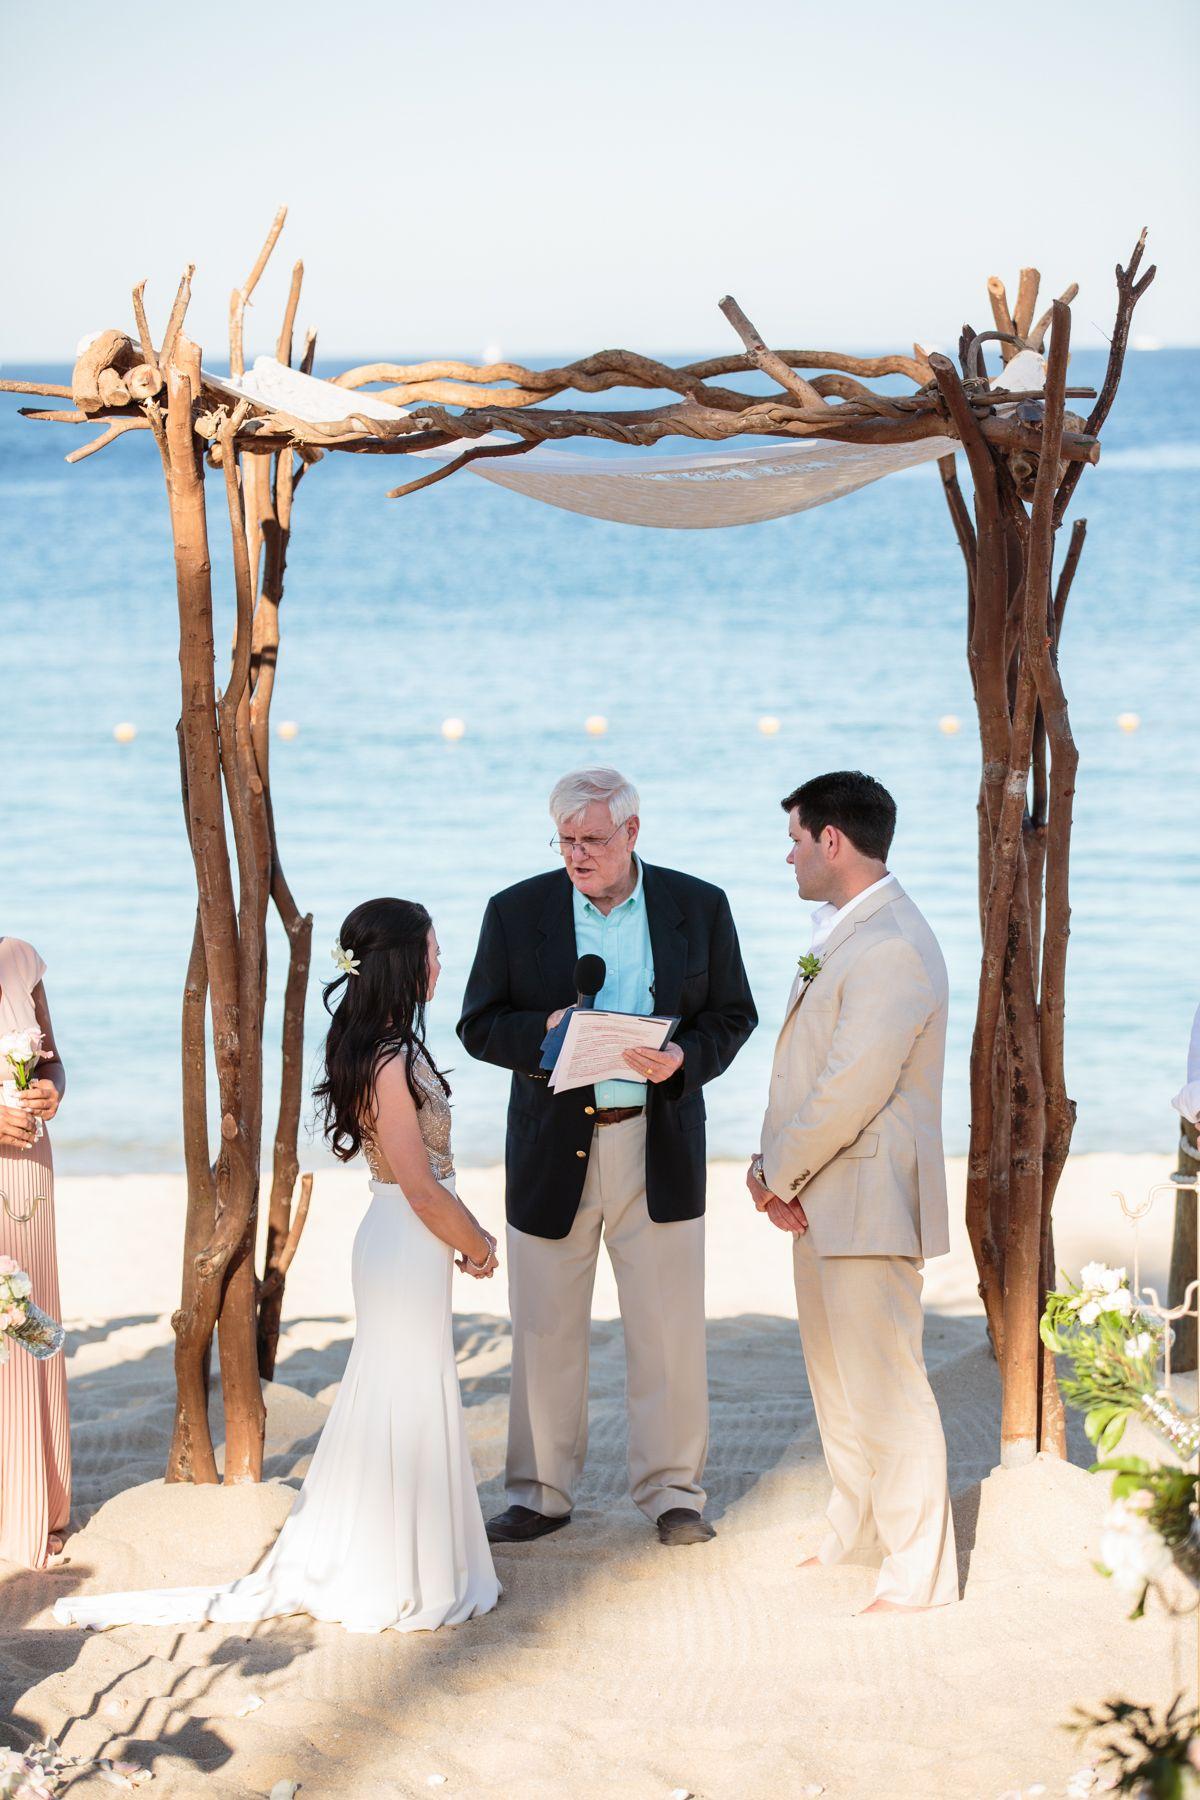 ceremony Nude wedding